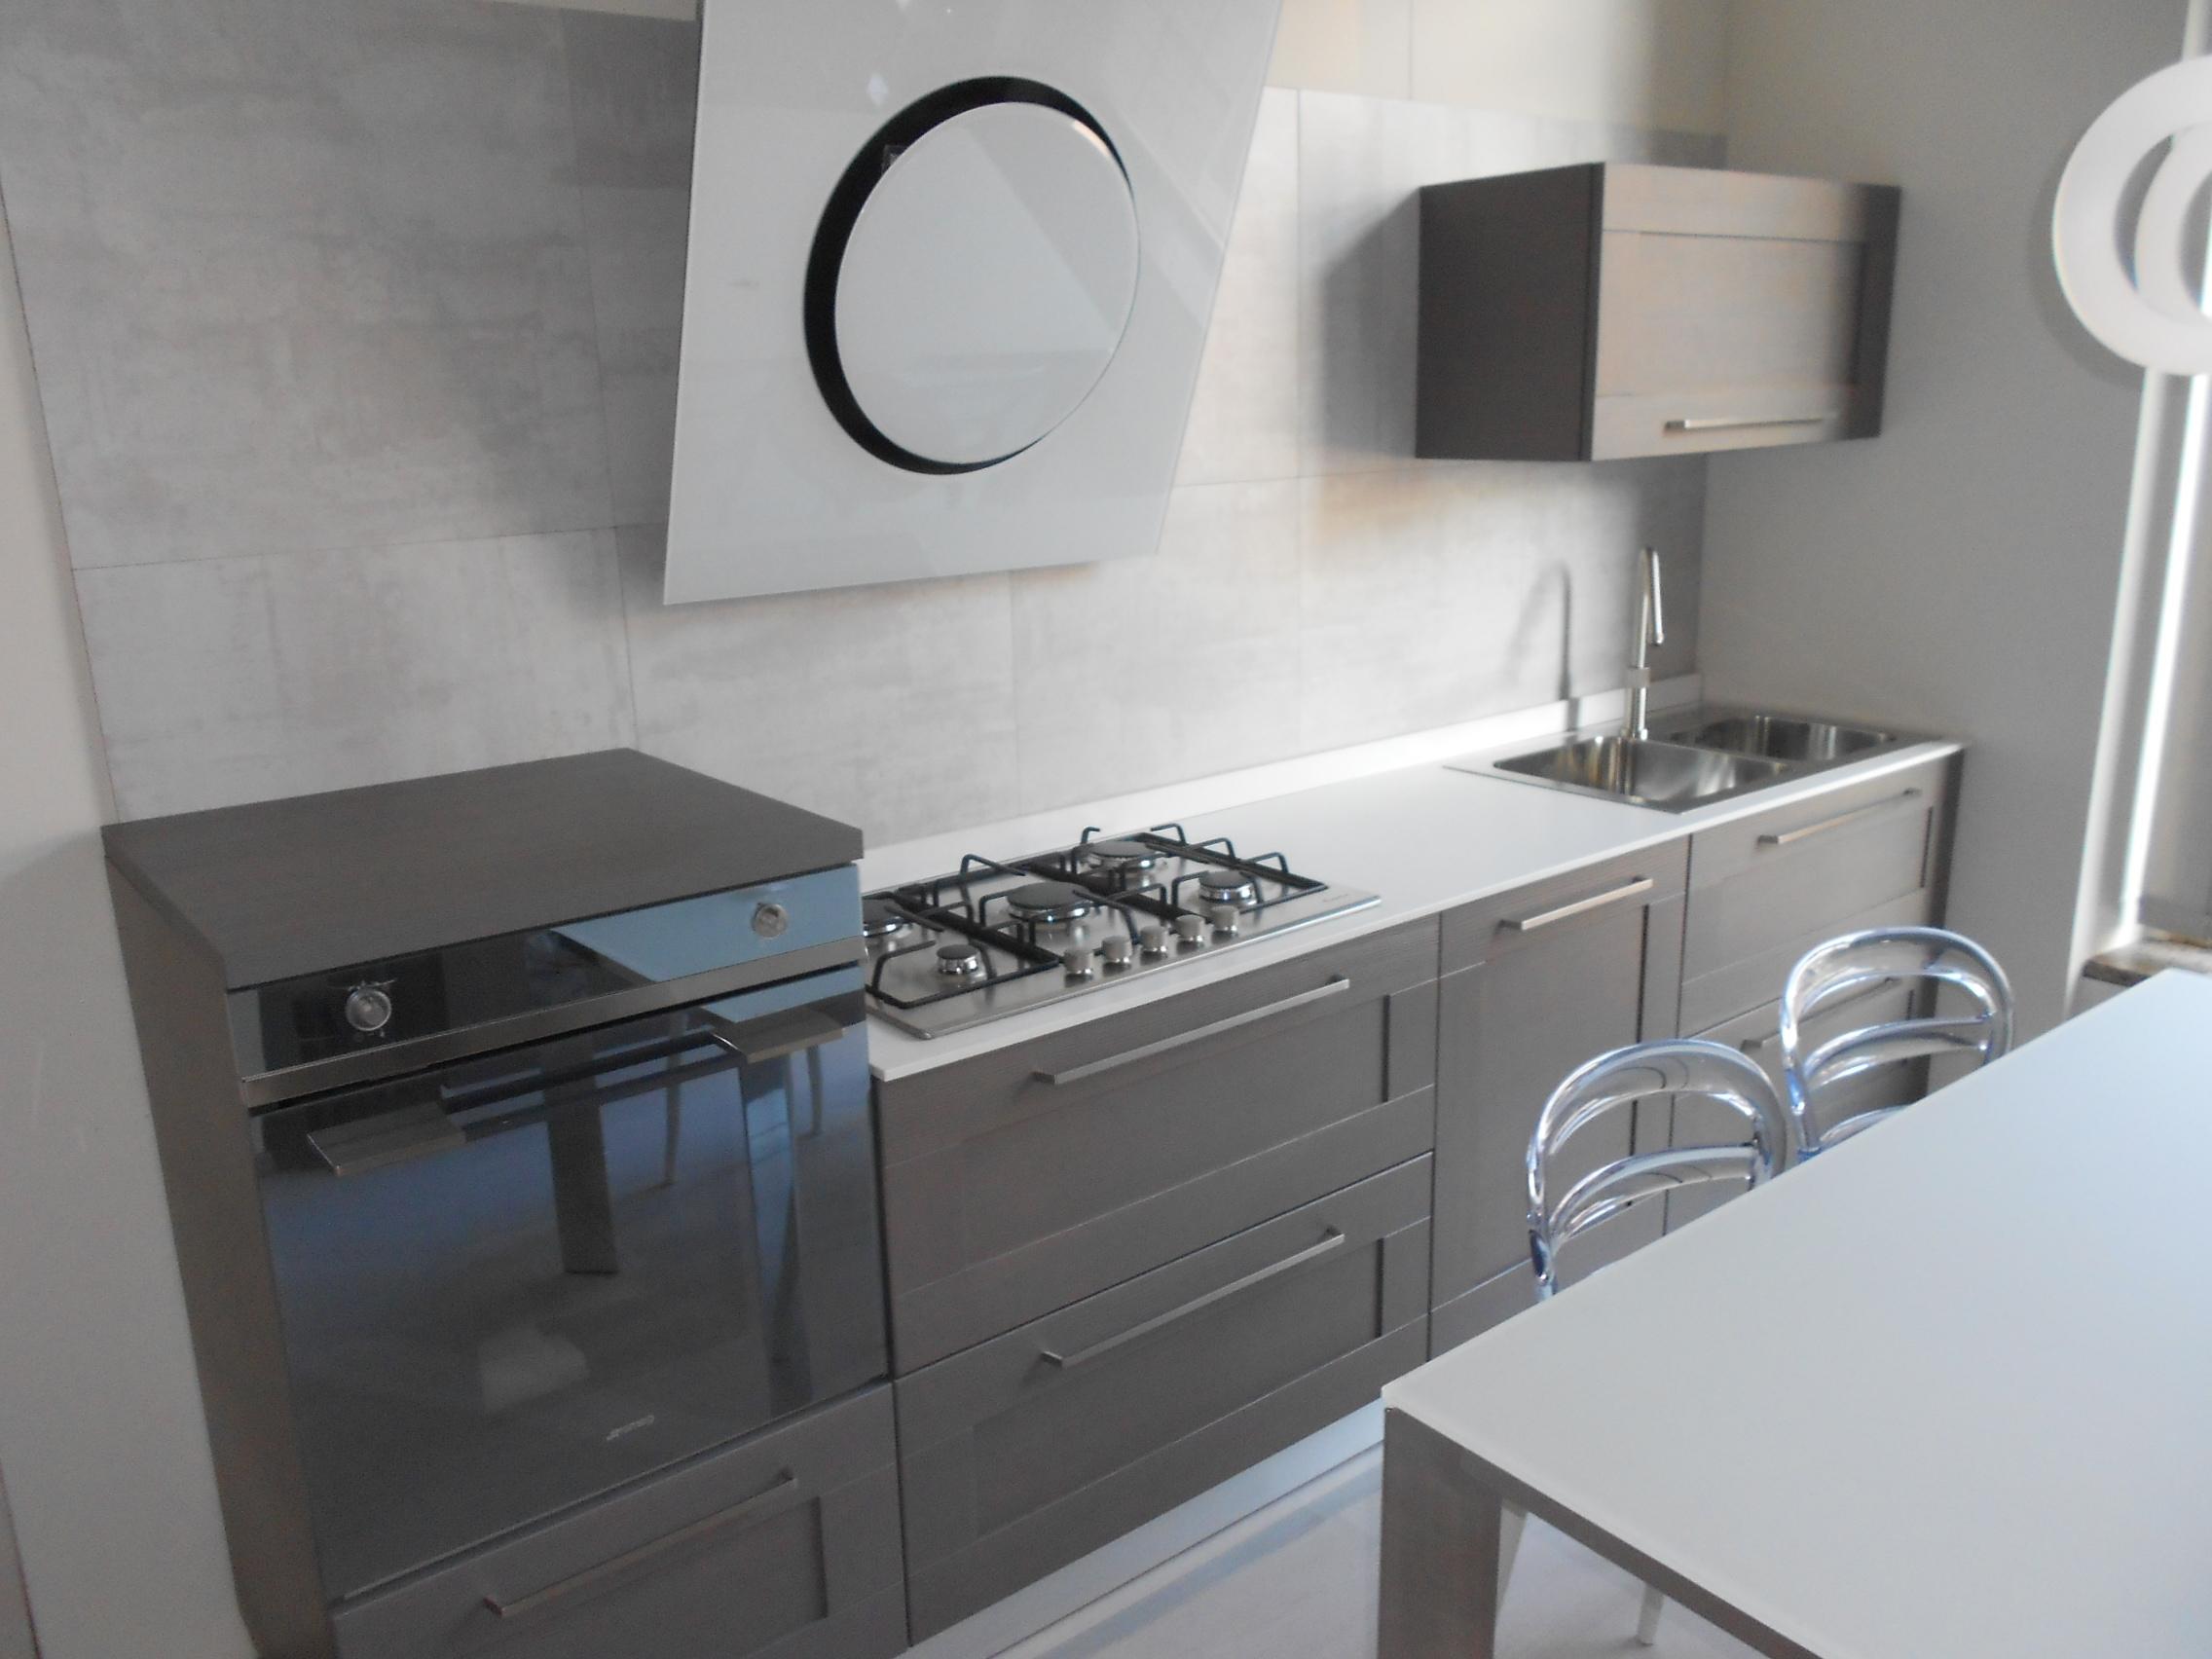 Prezzi cucine moderno in offerta